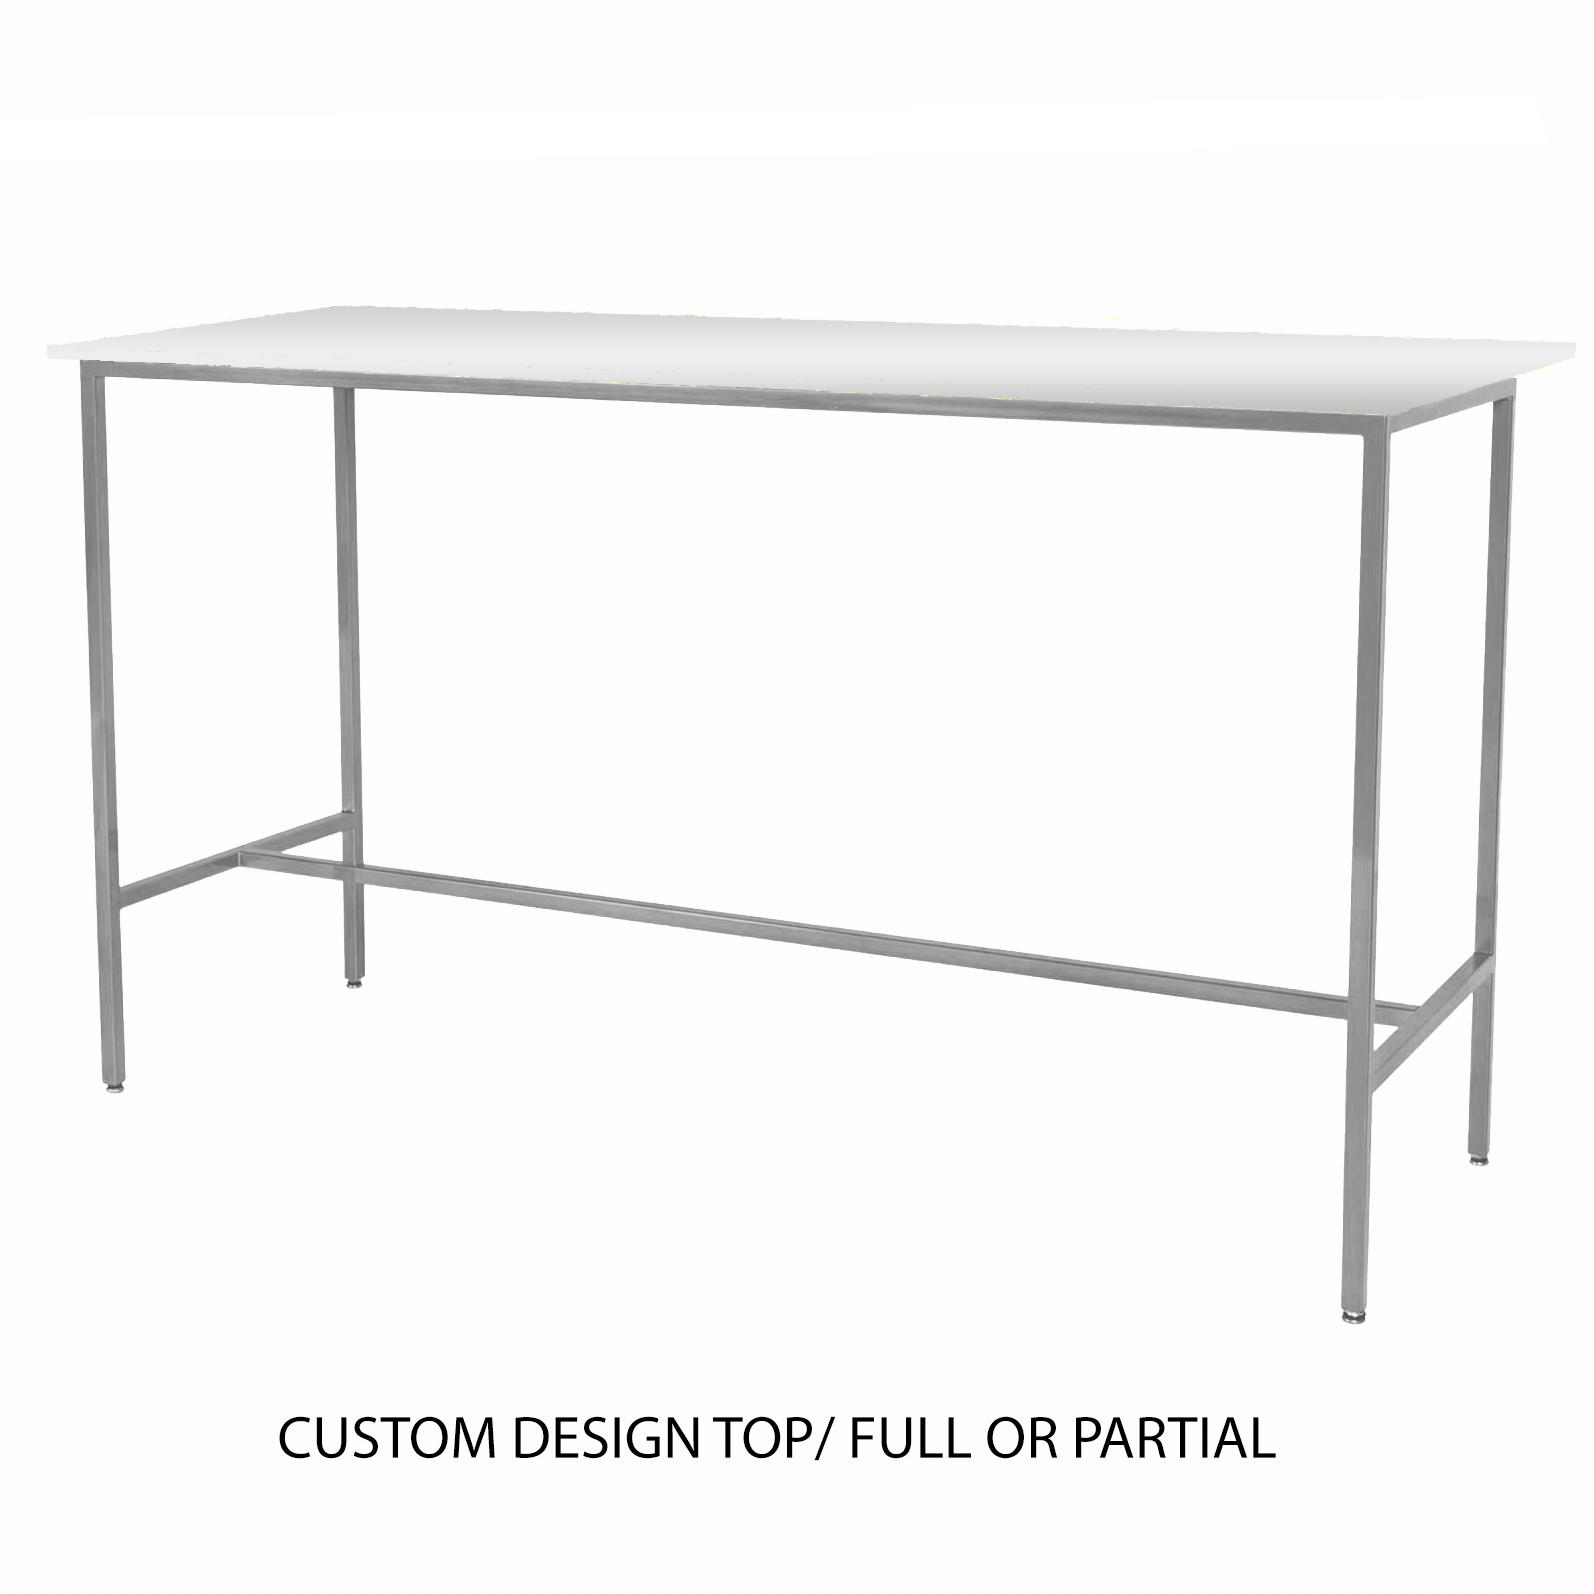 Custom Top/Silver Taylor Communal Table  $200